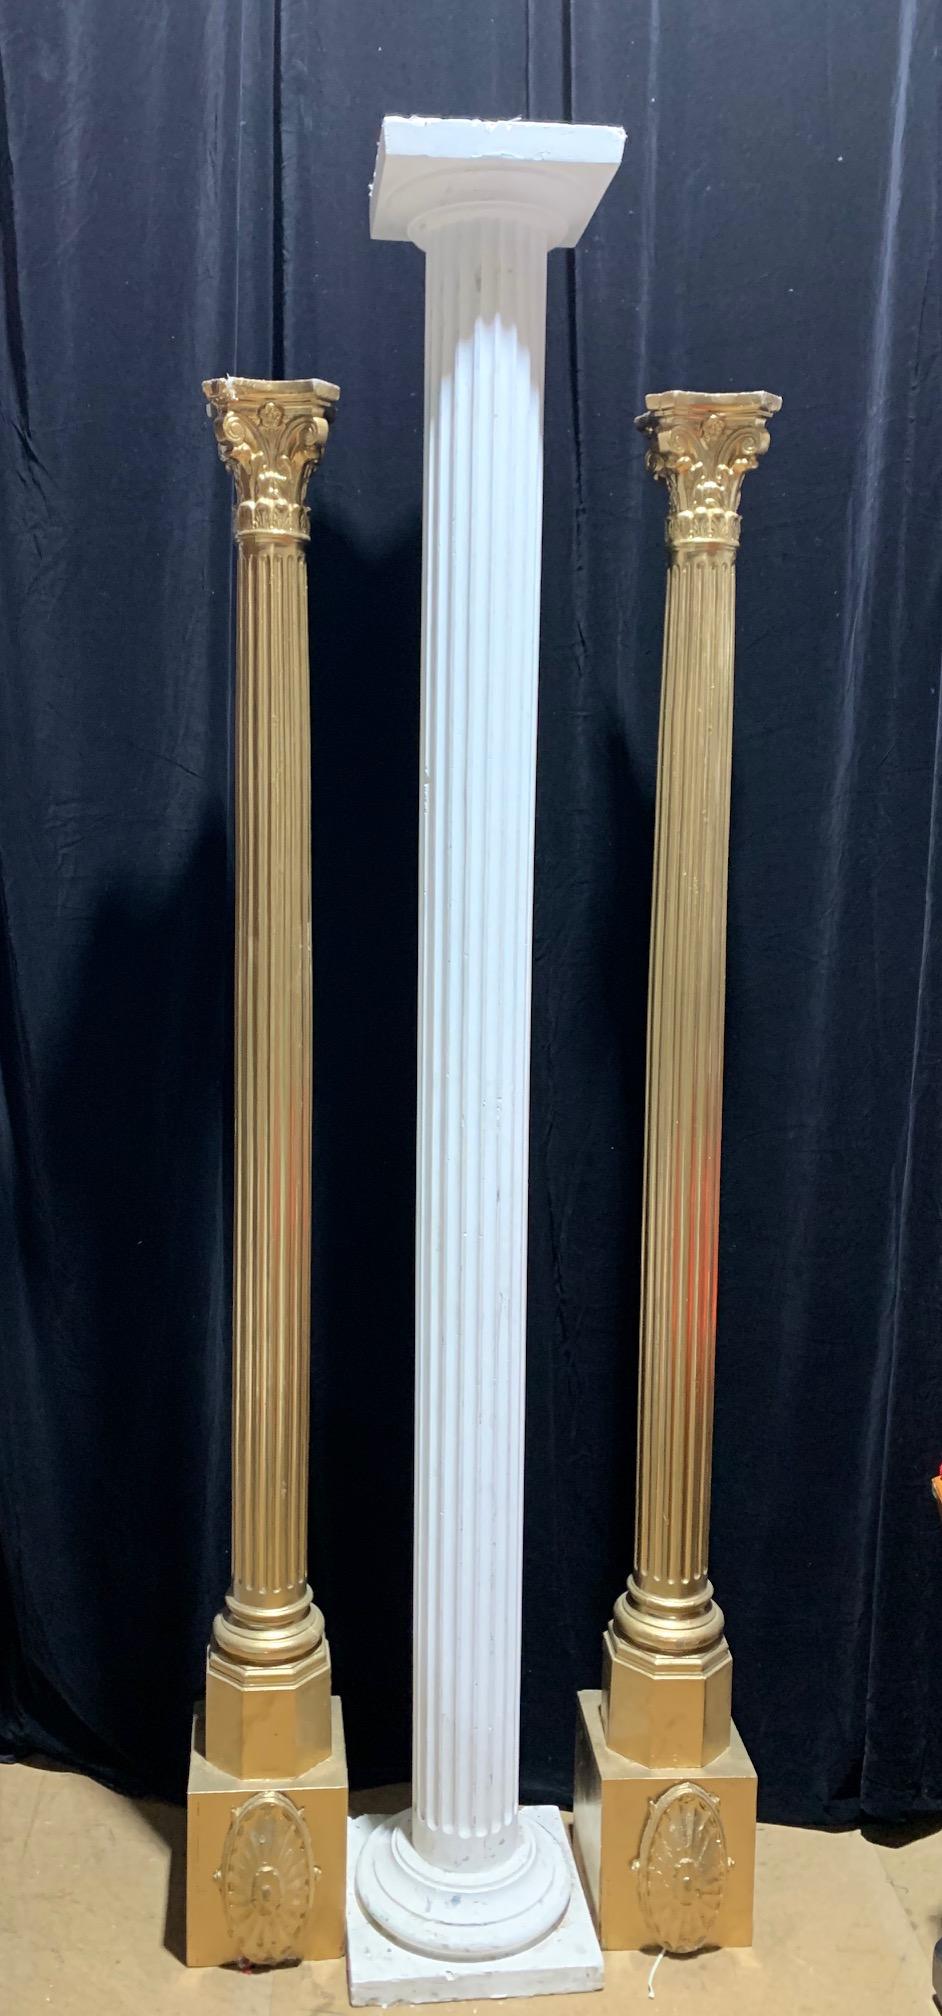 Slender Ribbed Columns - Prop For Hire